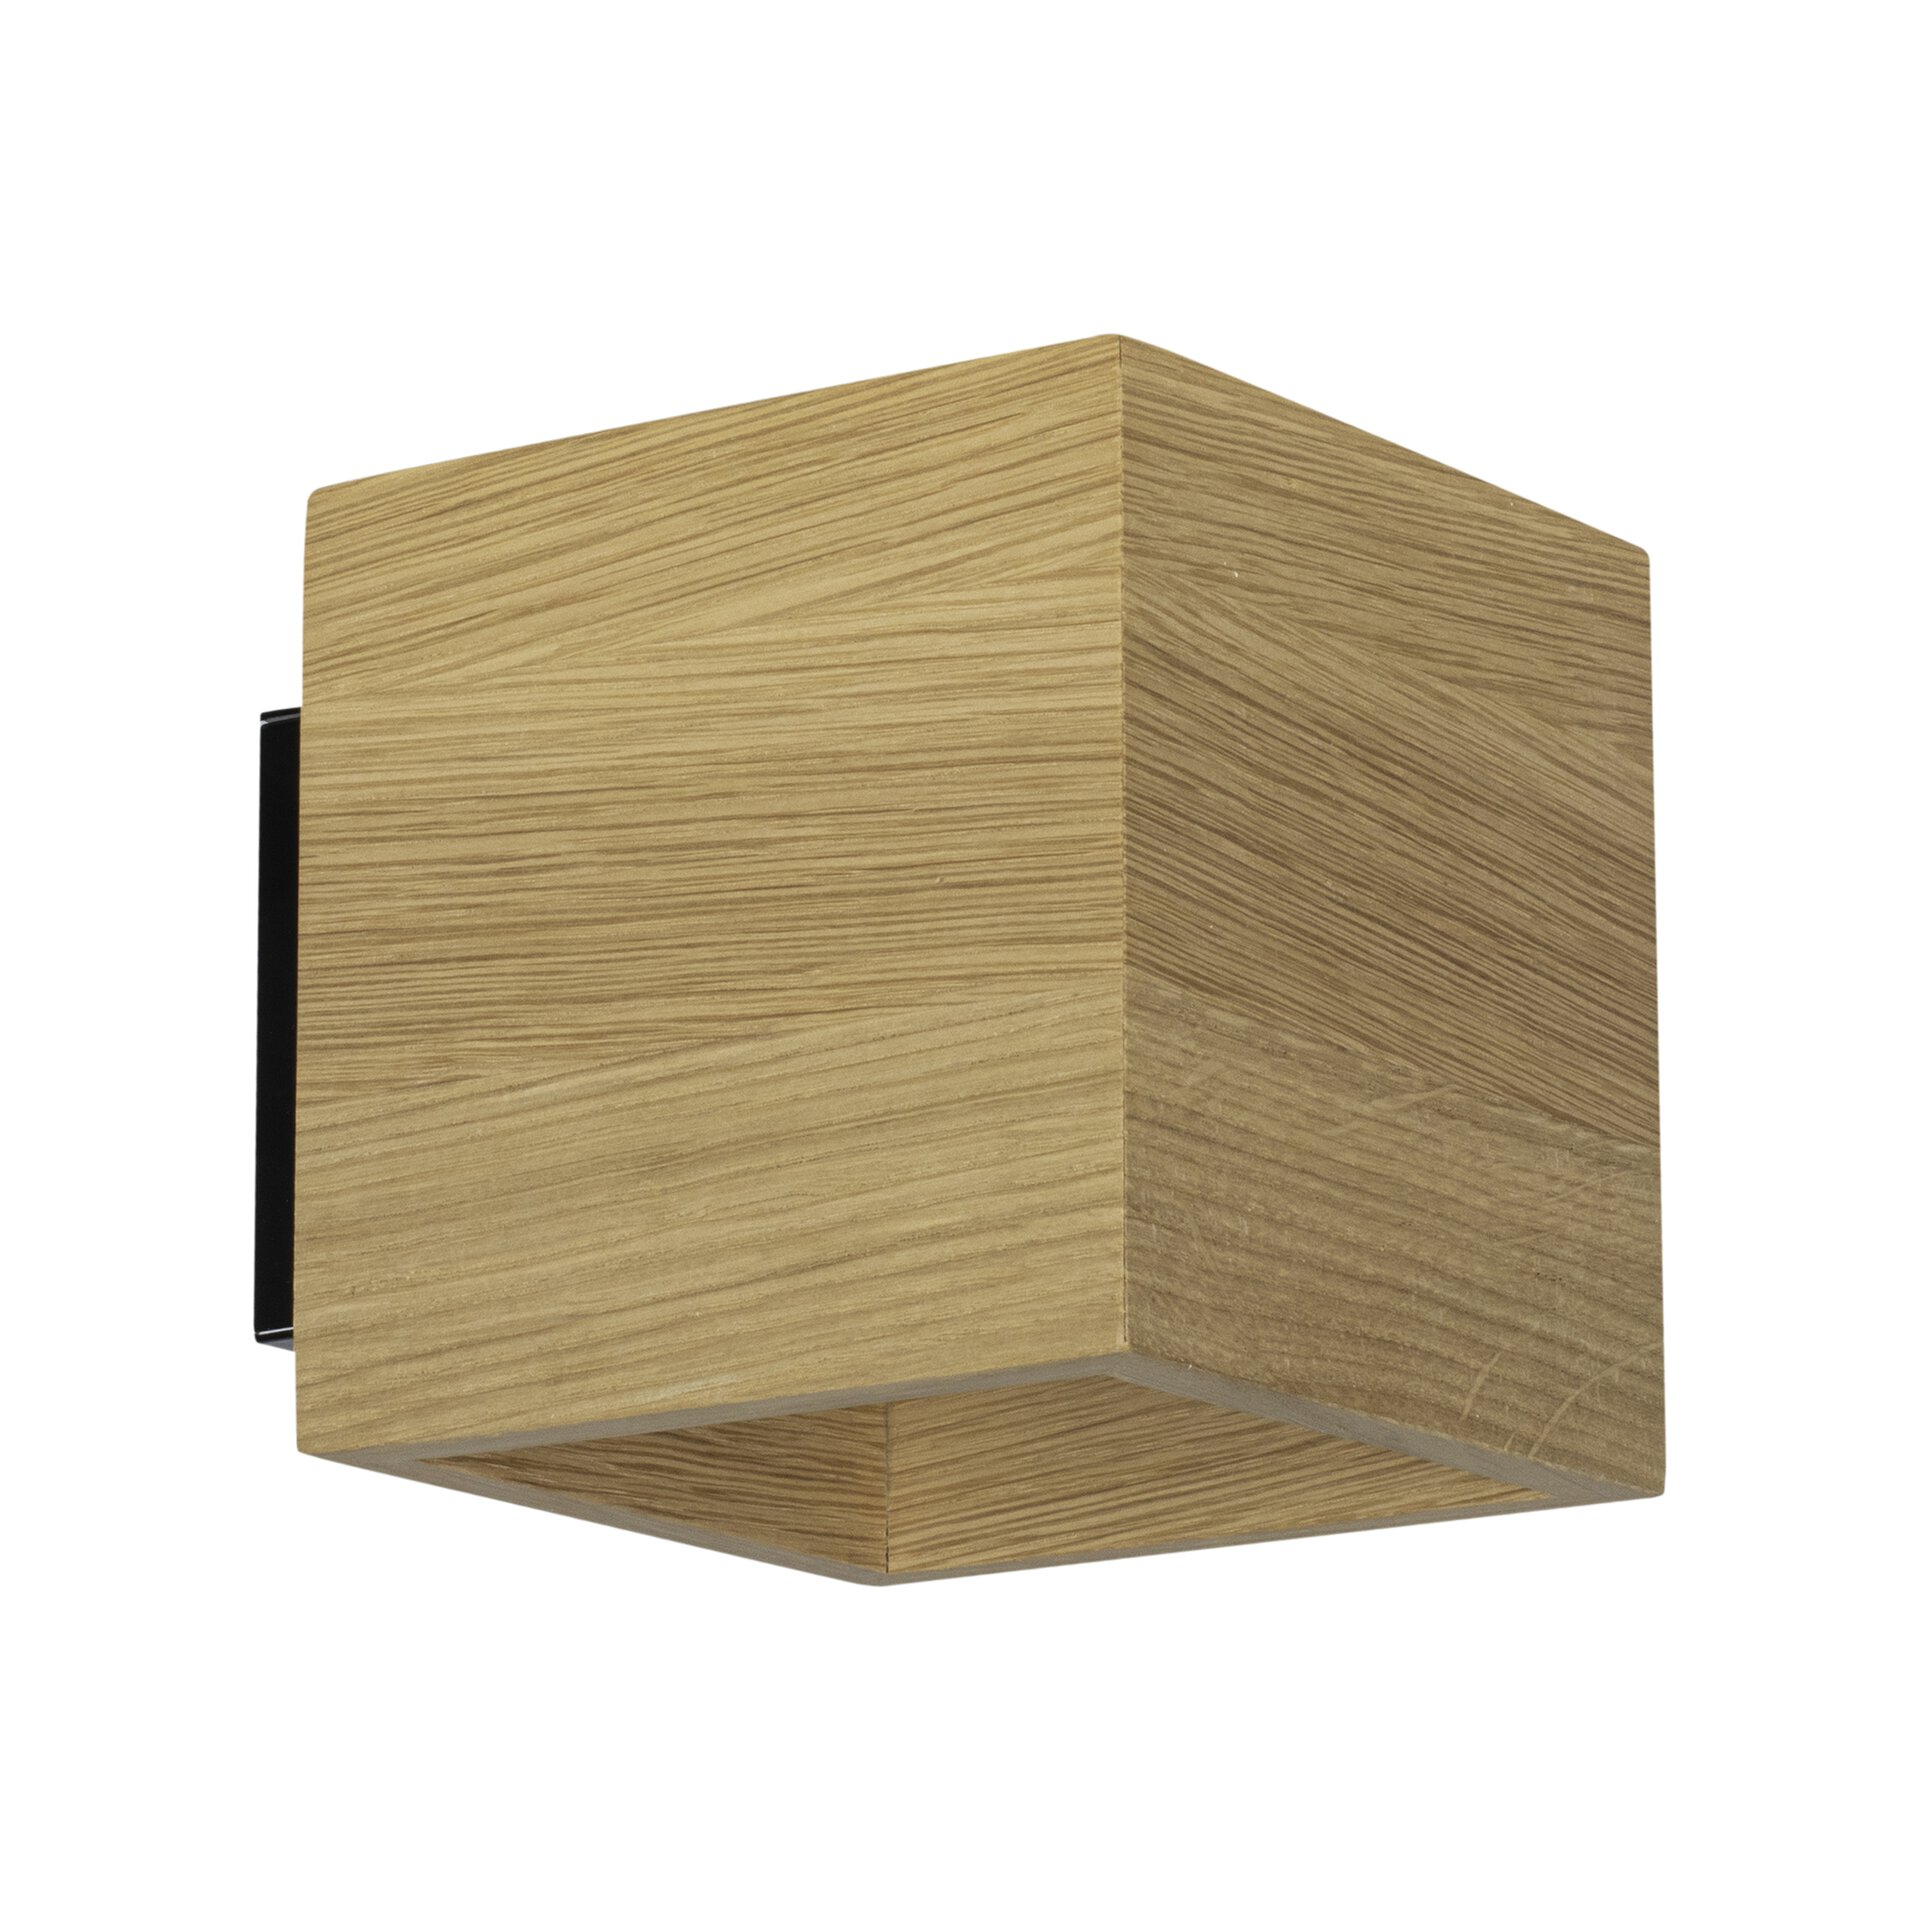 Wandleuchte BARRIS MONDO Holz braun 11 x 13 x 11 cm